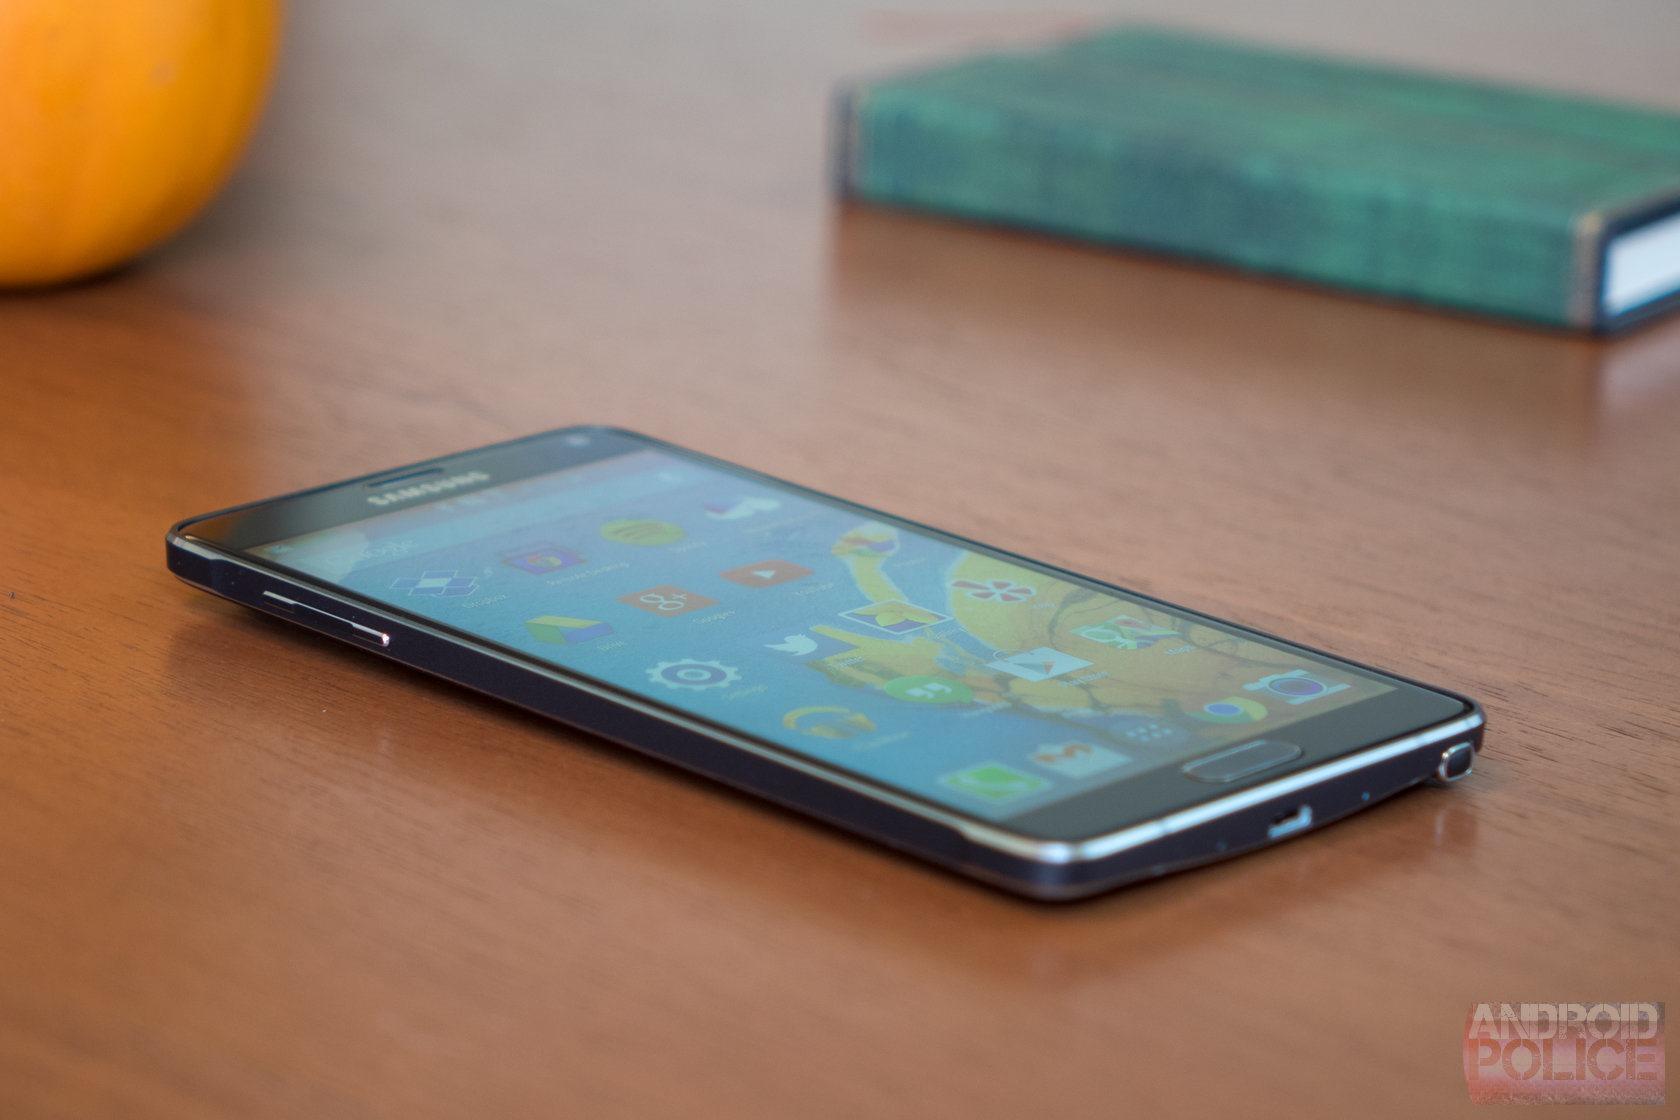 Verizon Galaxy Note 4 Bootloader Unlocked Courtesy Of Beaups